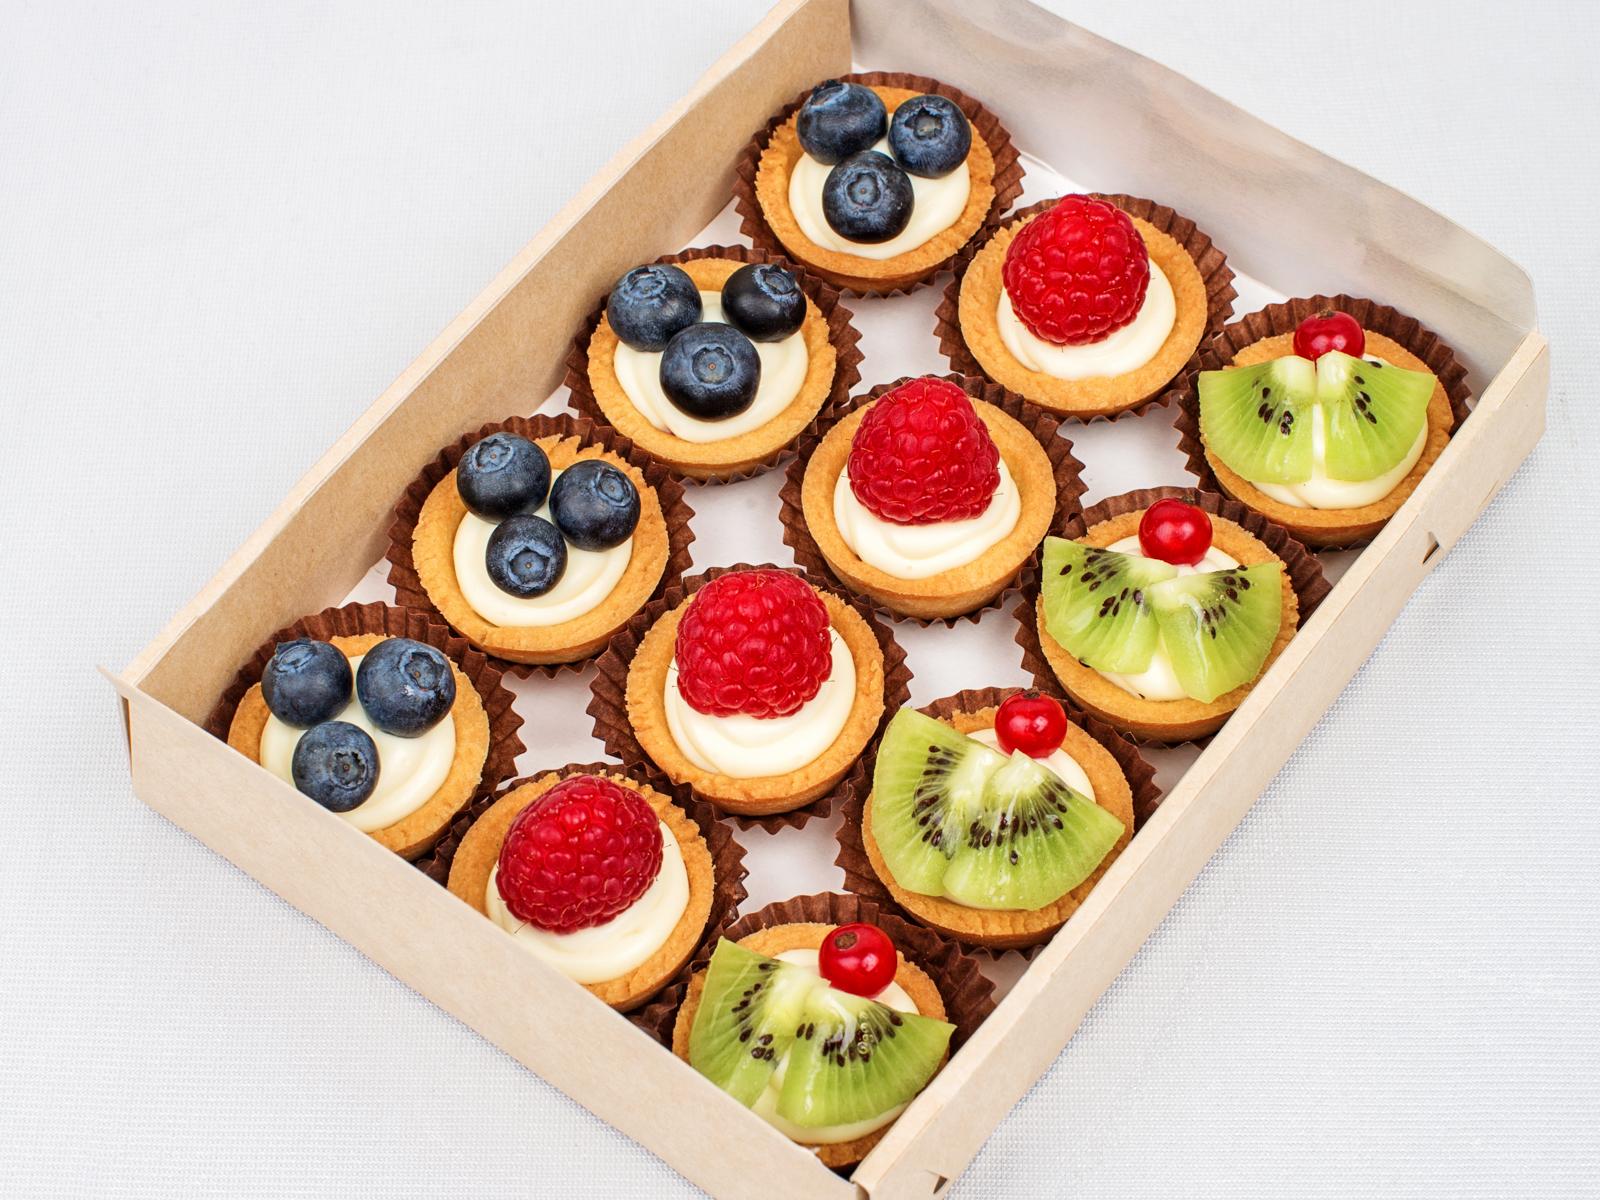 Тарталетки со свежими ягодами